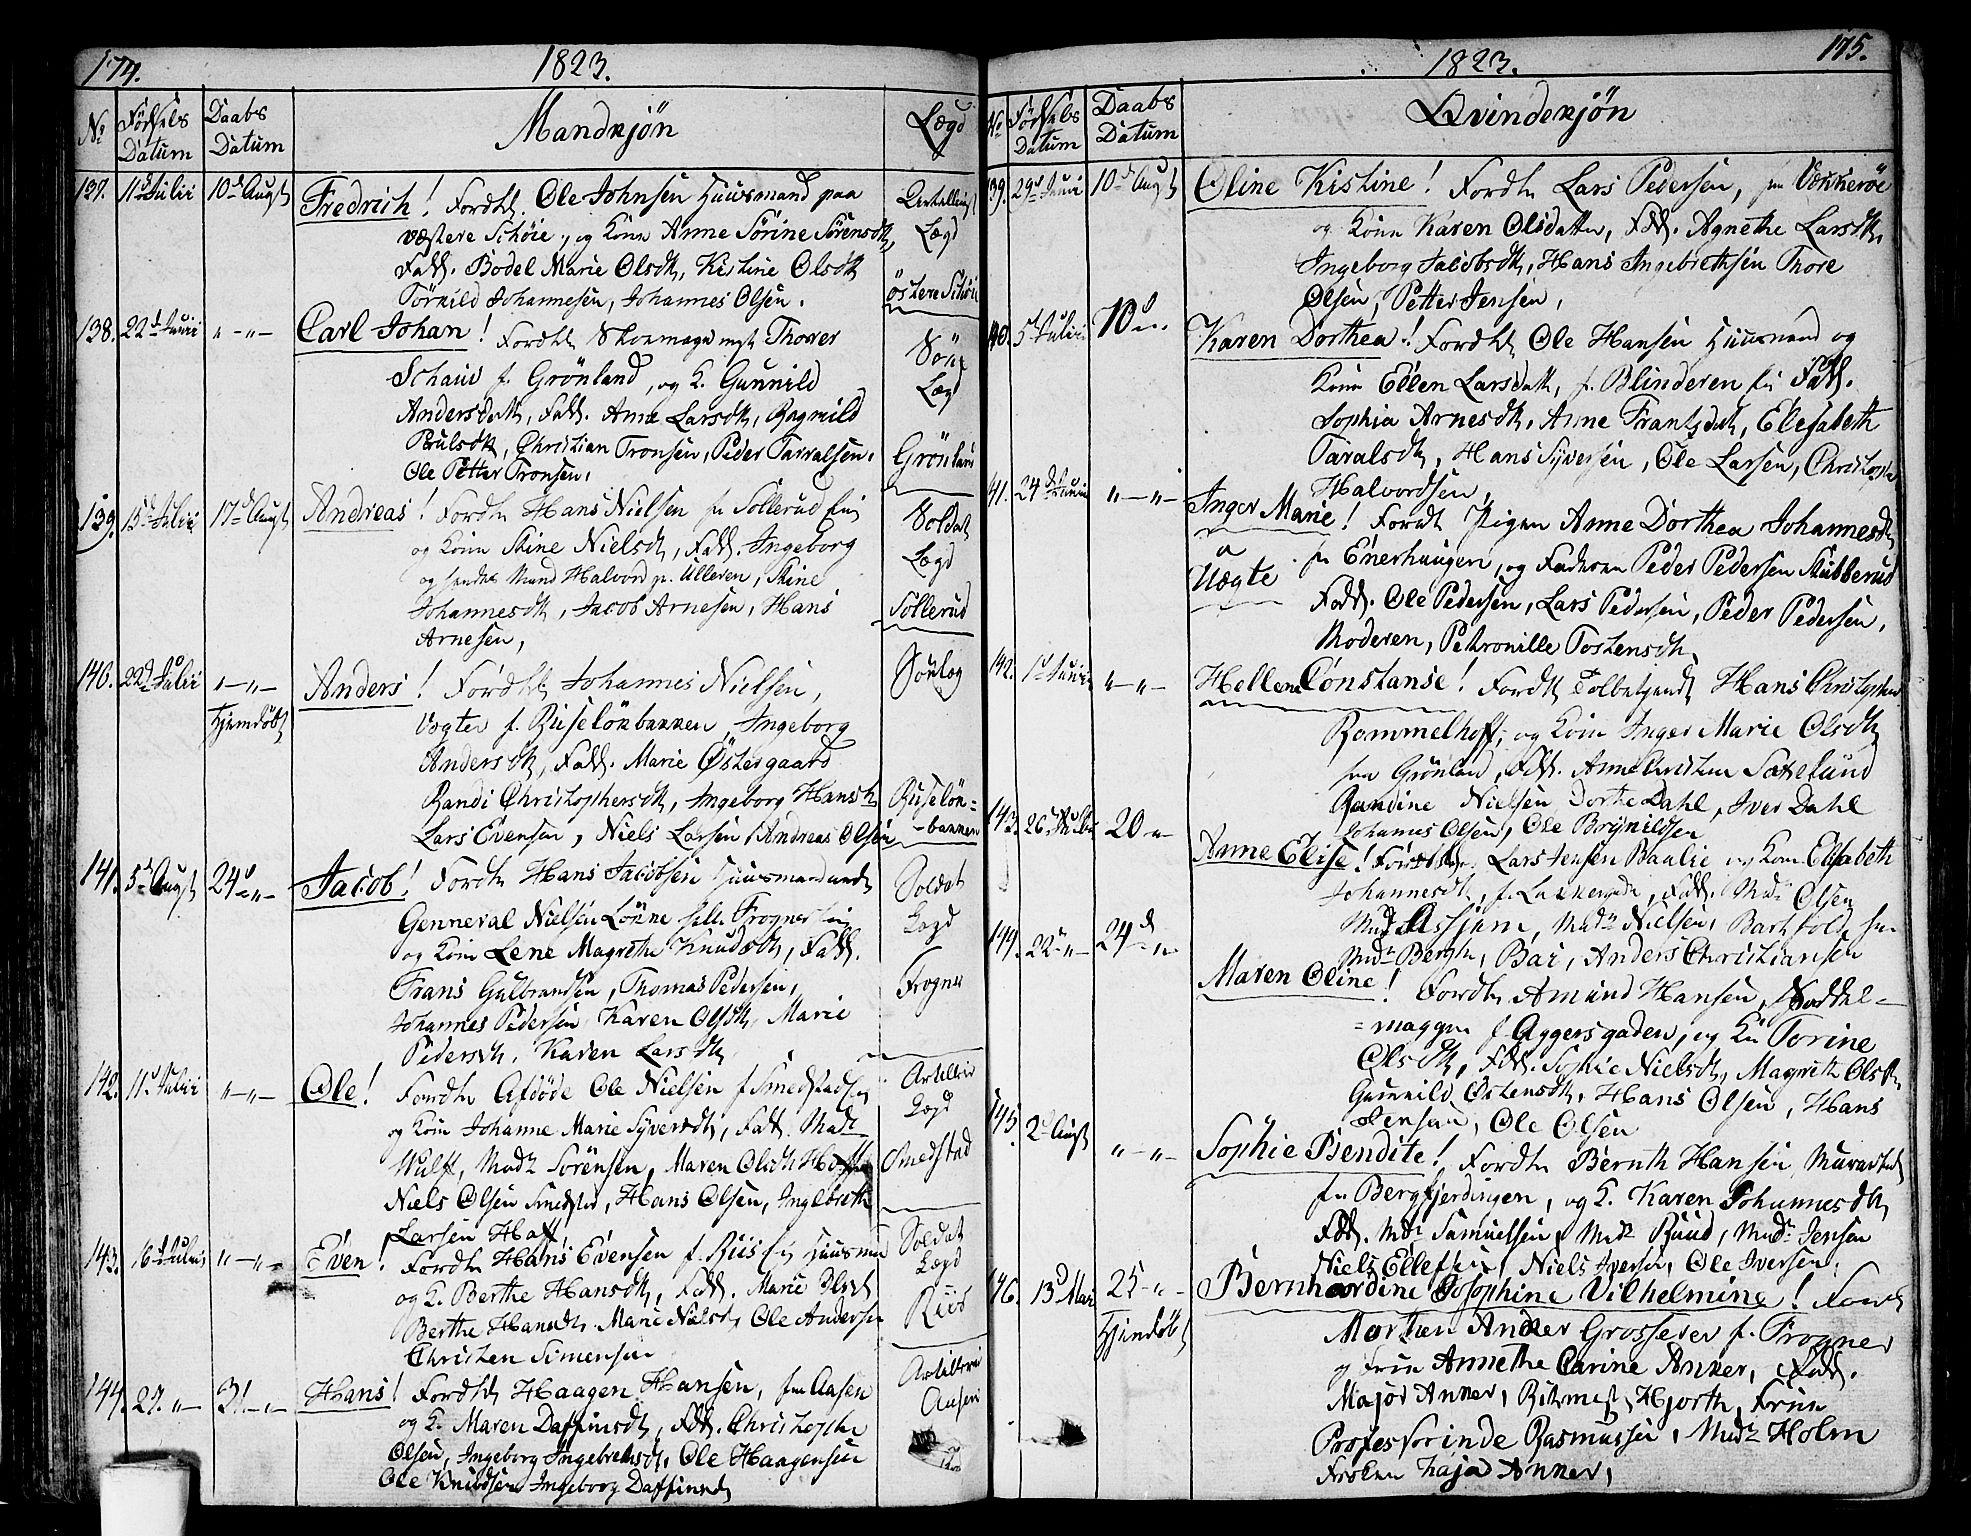 SAO, Aker prestekontor kirkebøker, G/L0004: Parish register (copy) no. 4, 1819-1829, p. 174-175